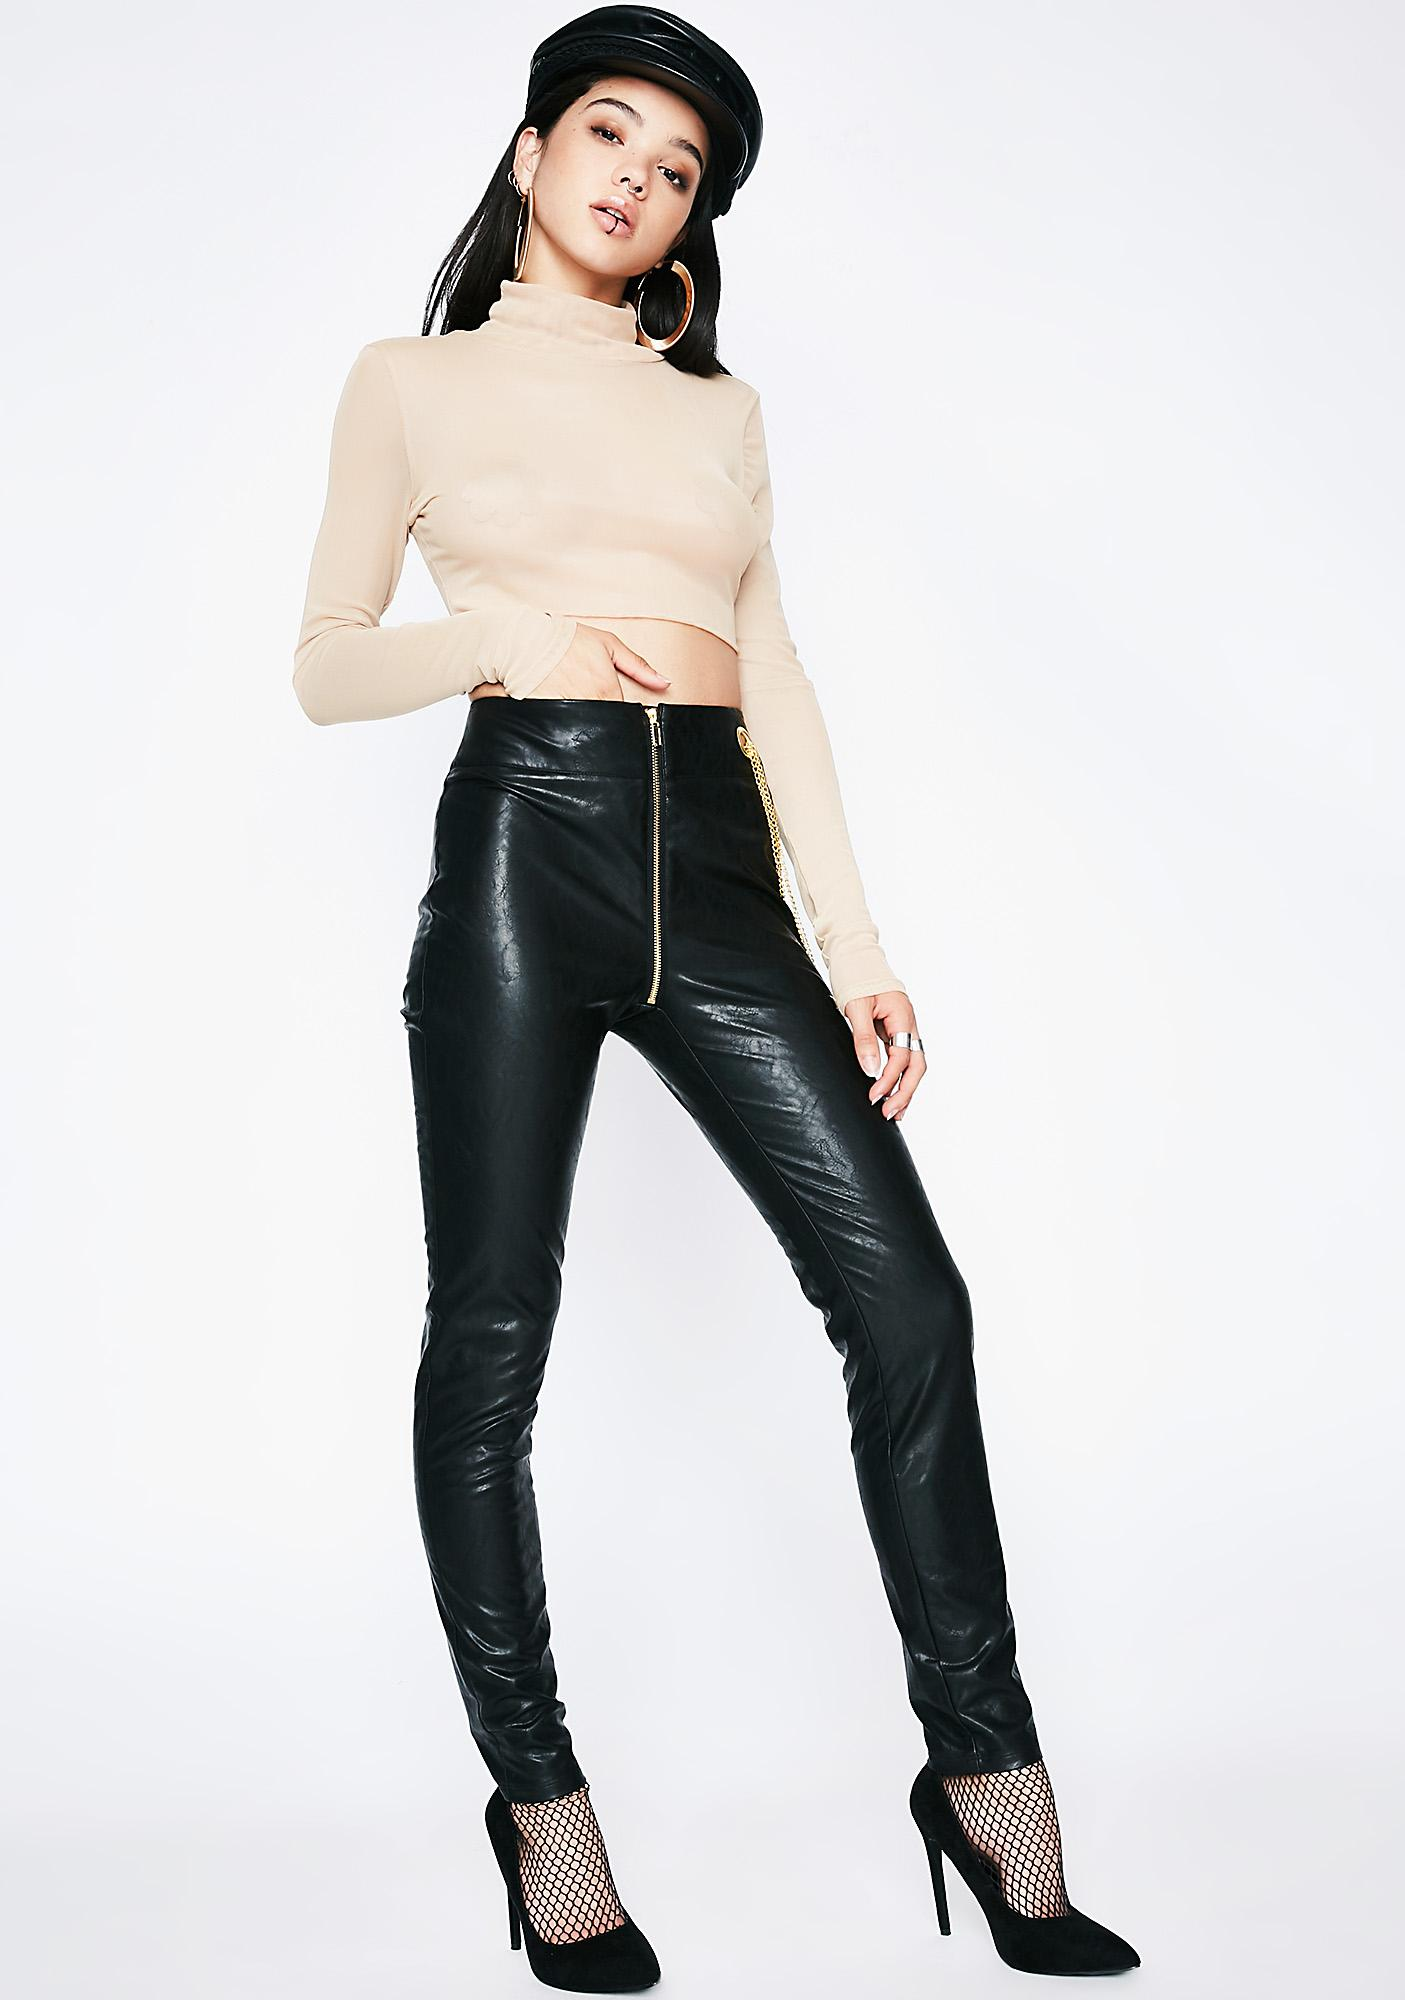 Poster Grl Hit 'Em Up Style Skinny Pants